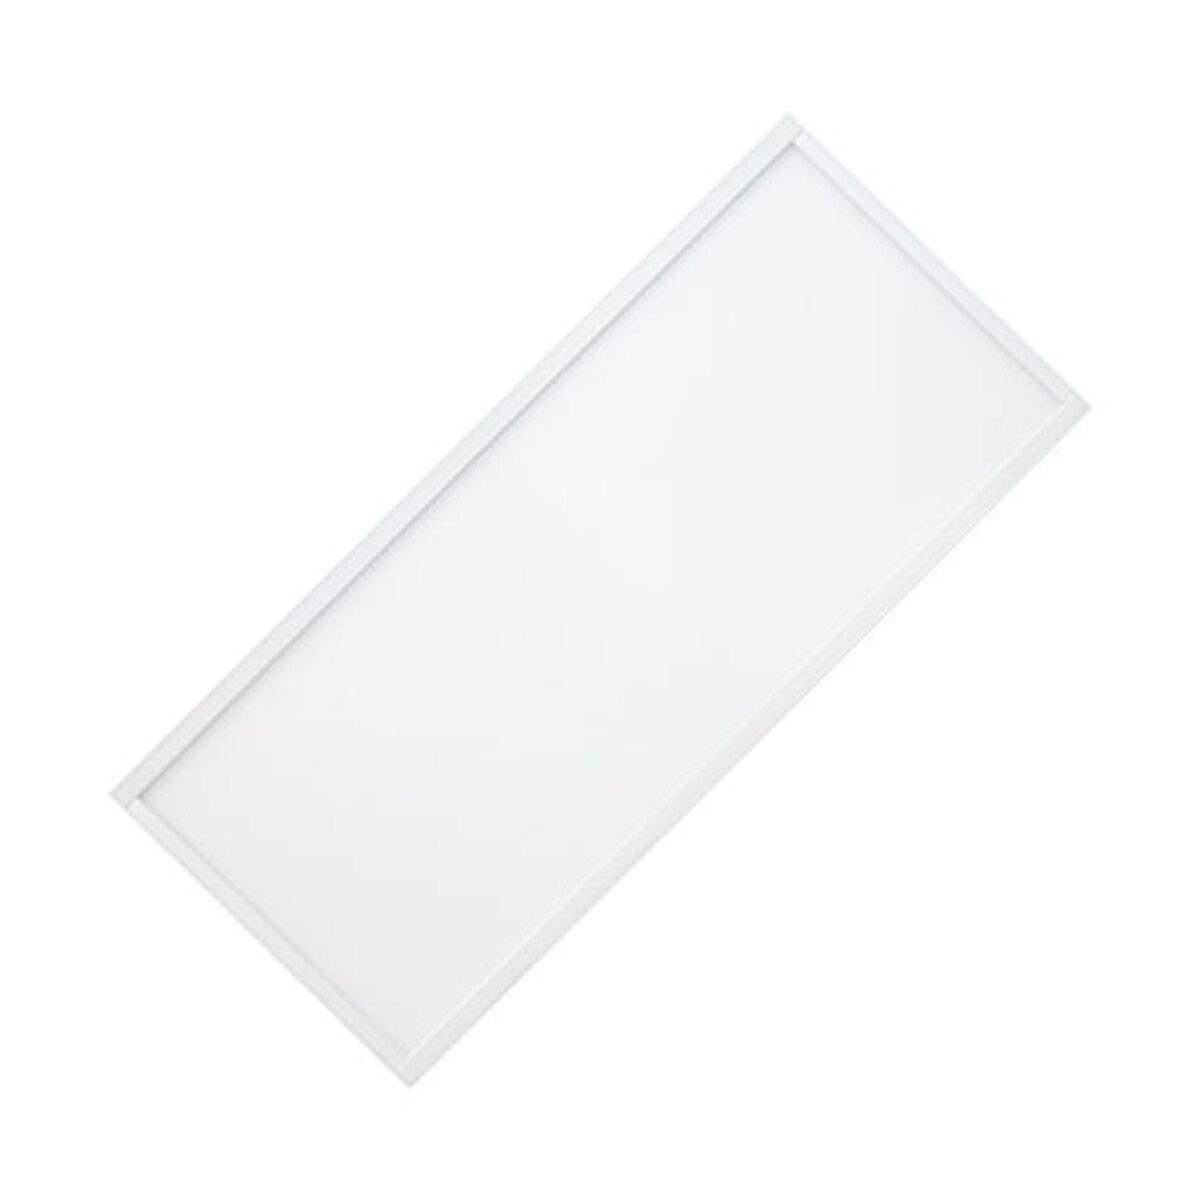 Bild 4 von LED-Panel Switch Tone 90x20cm